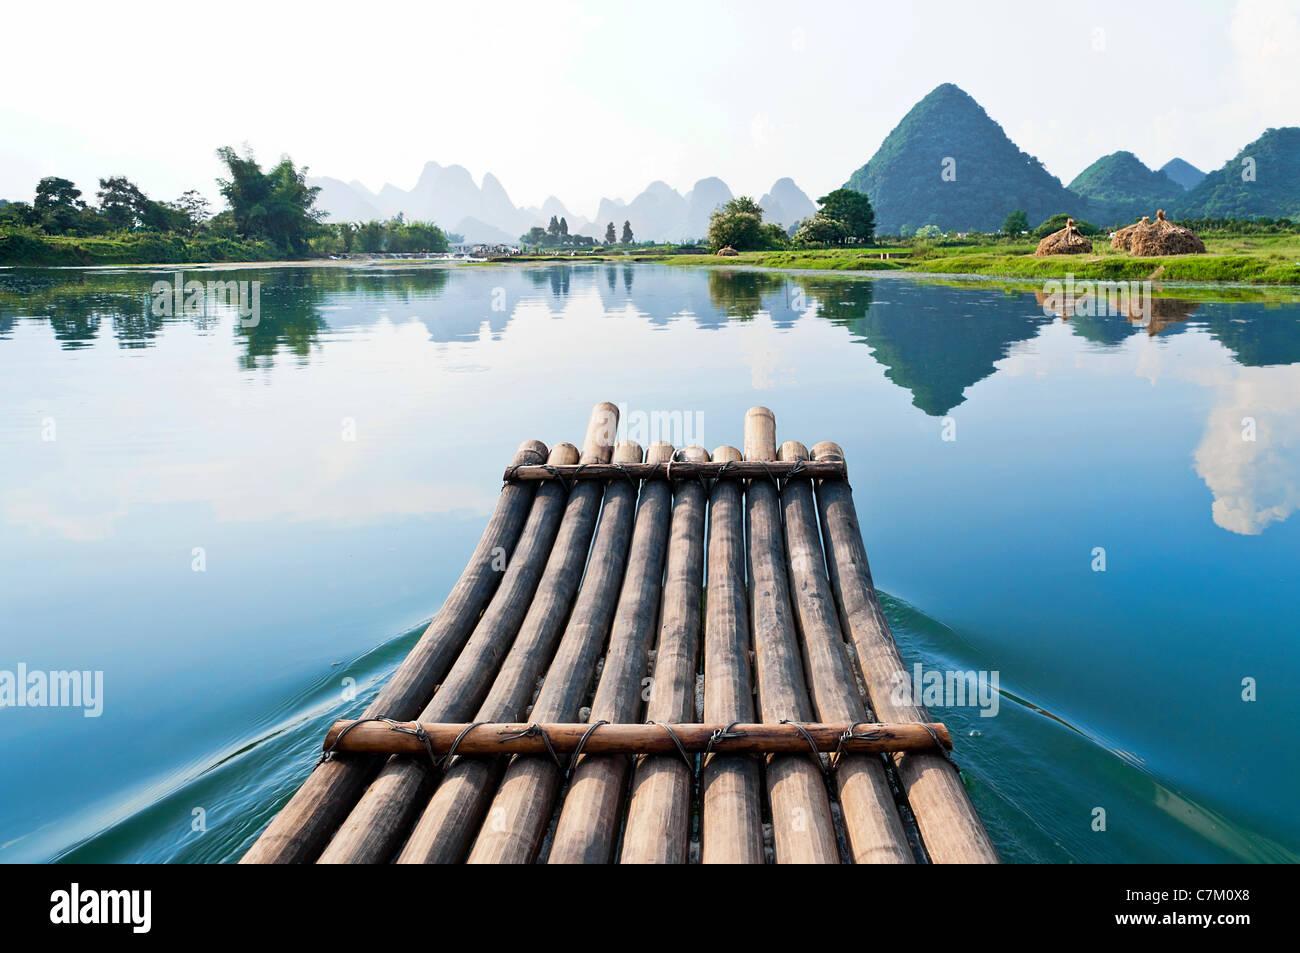 Il bambù rafting nel fiume Li, Guilin Yangshou - Cina Immagini Stock